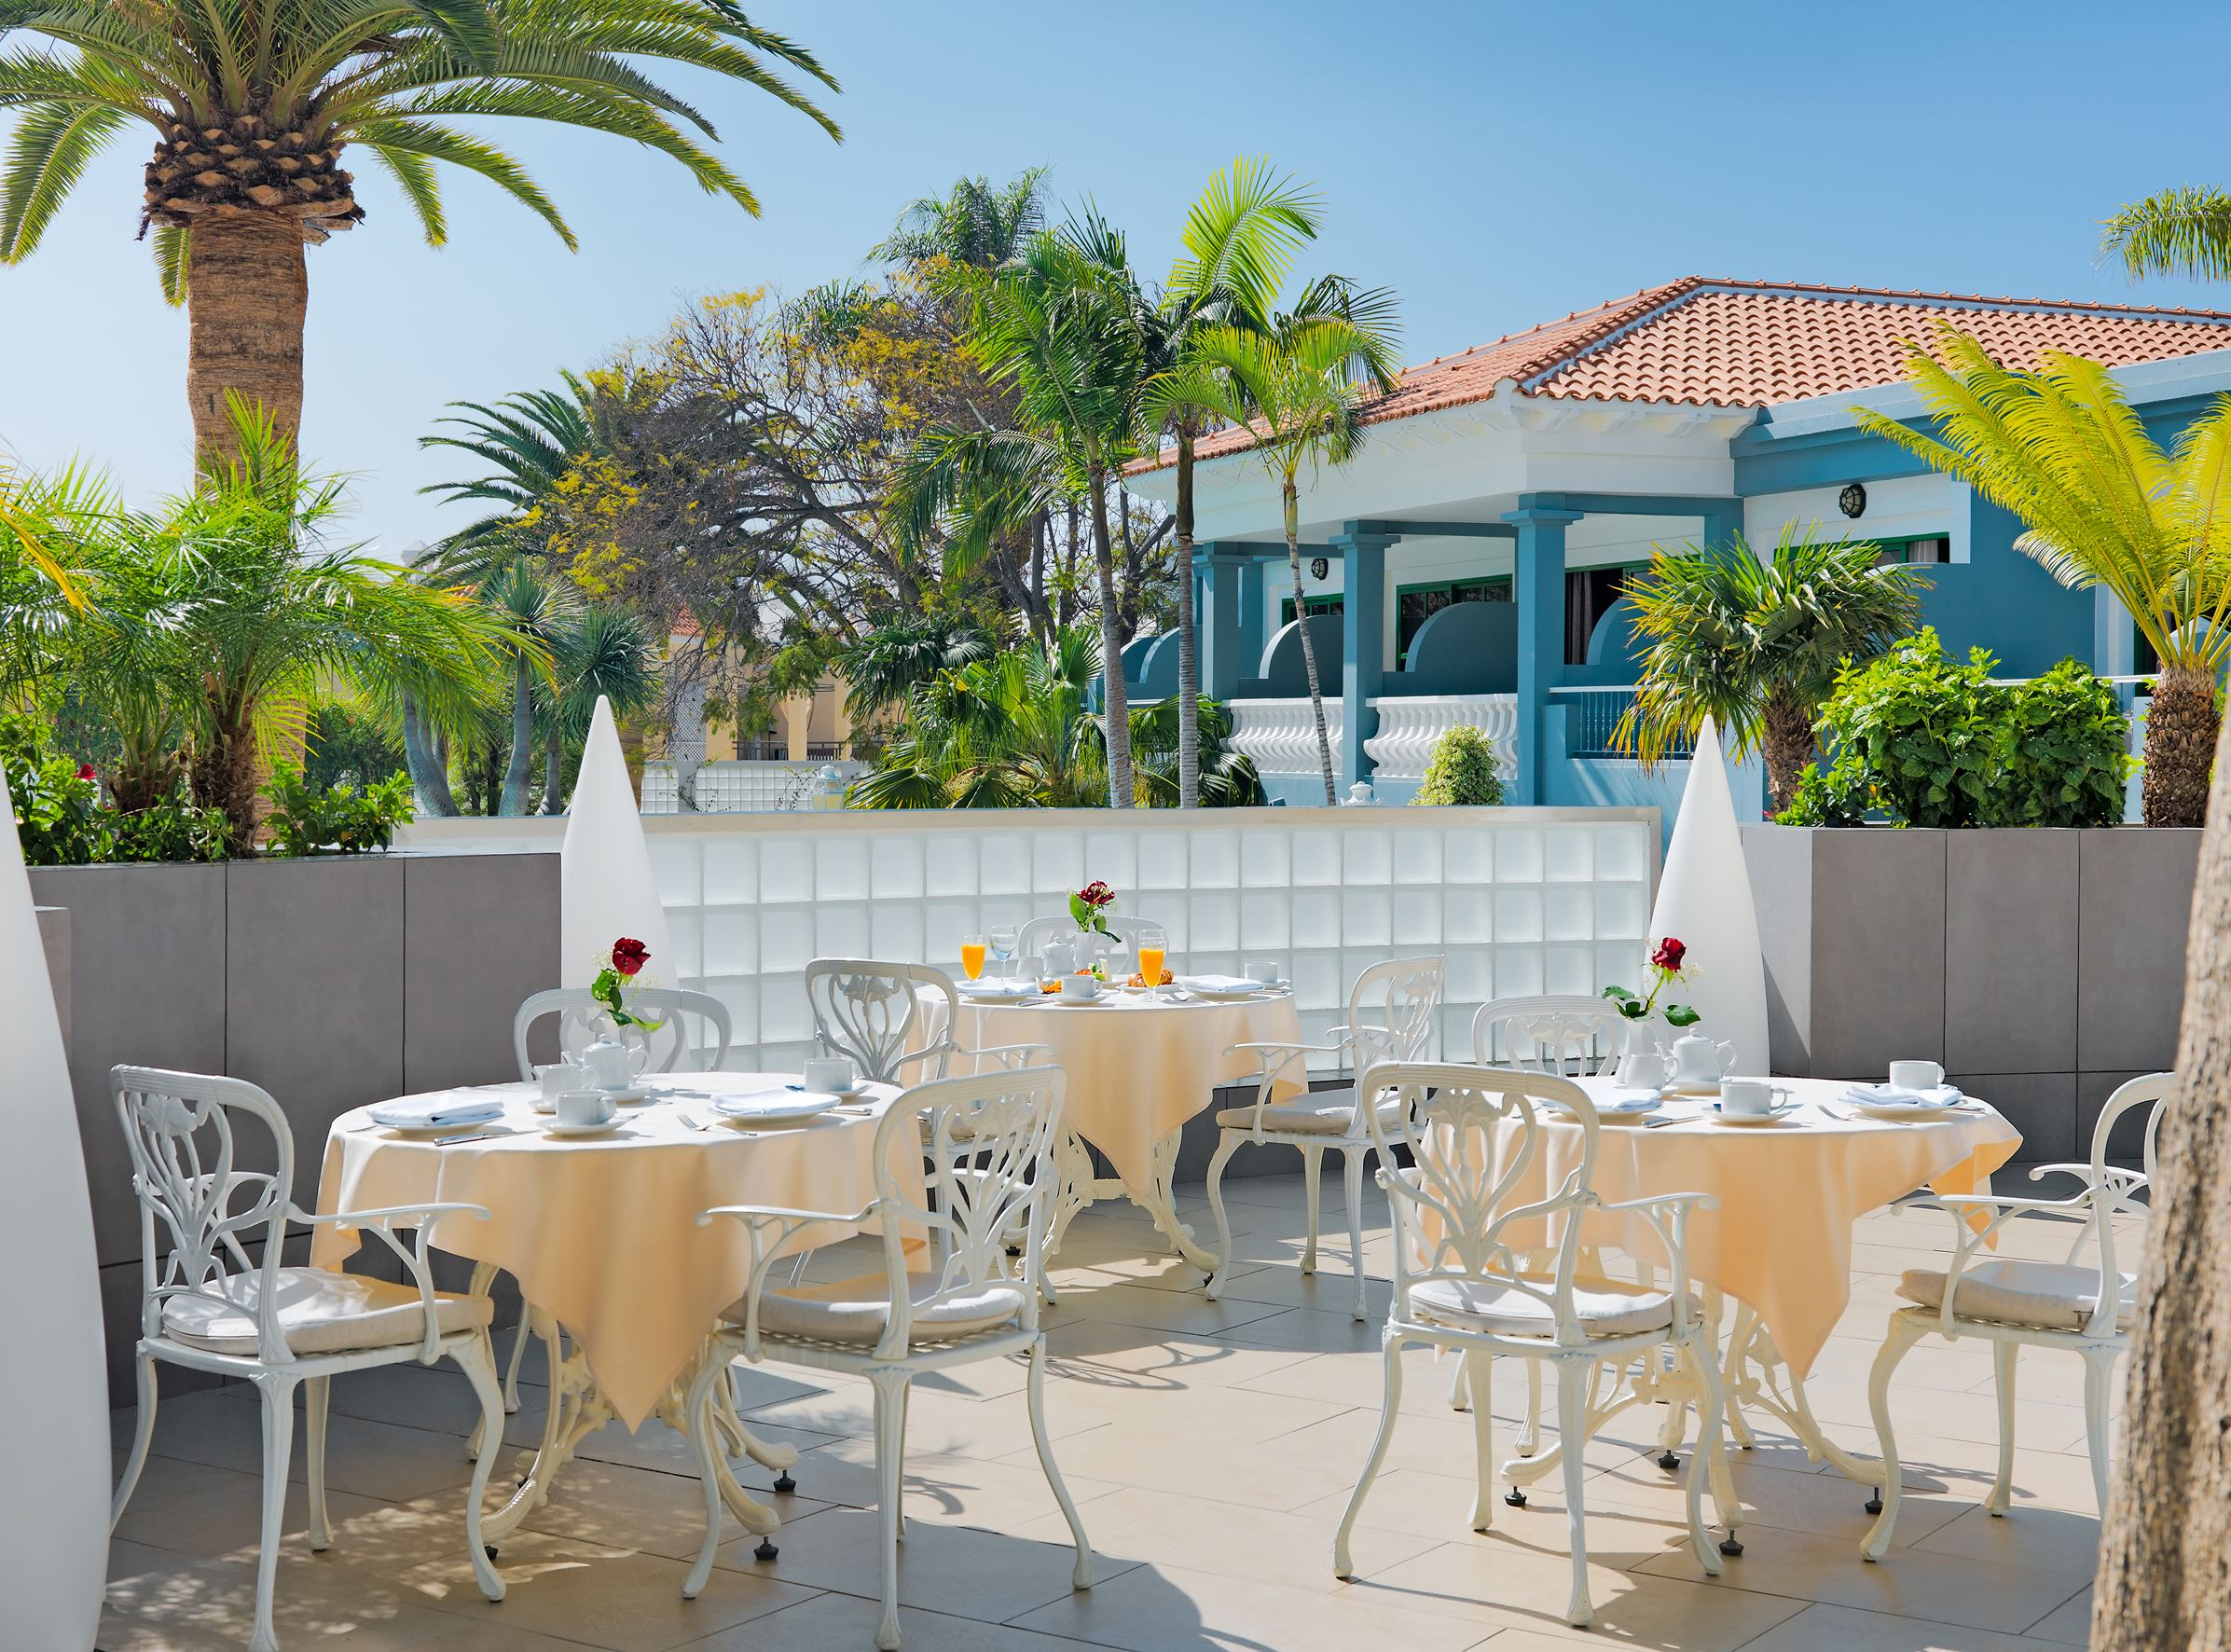 Frukost på Hotell Colon Guanahany, Playa de las Americas Teneriffa